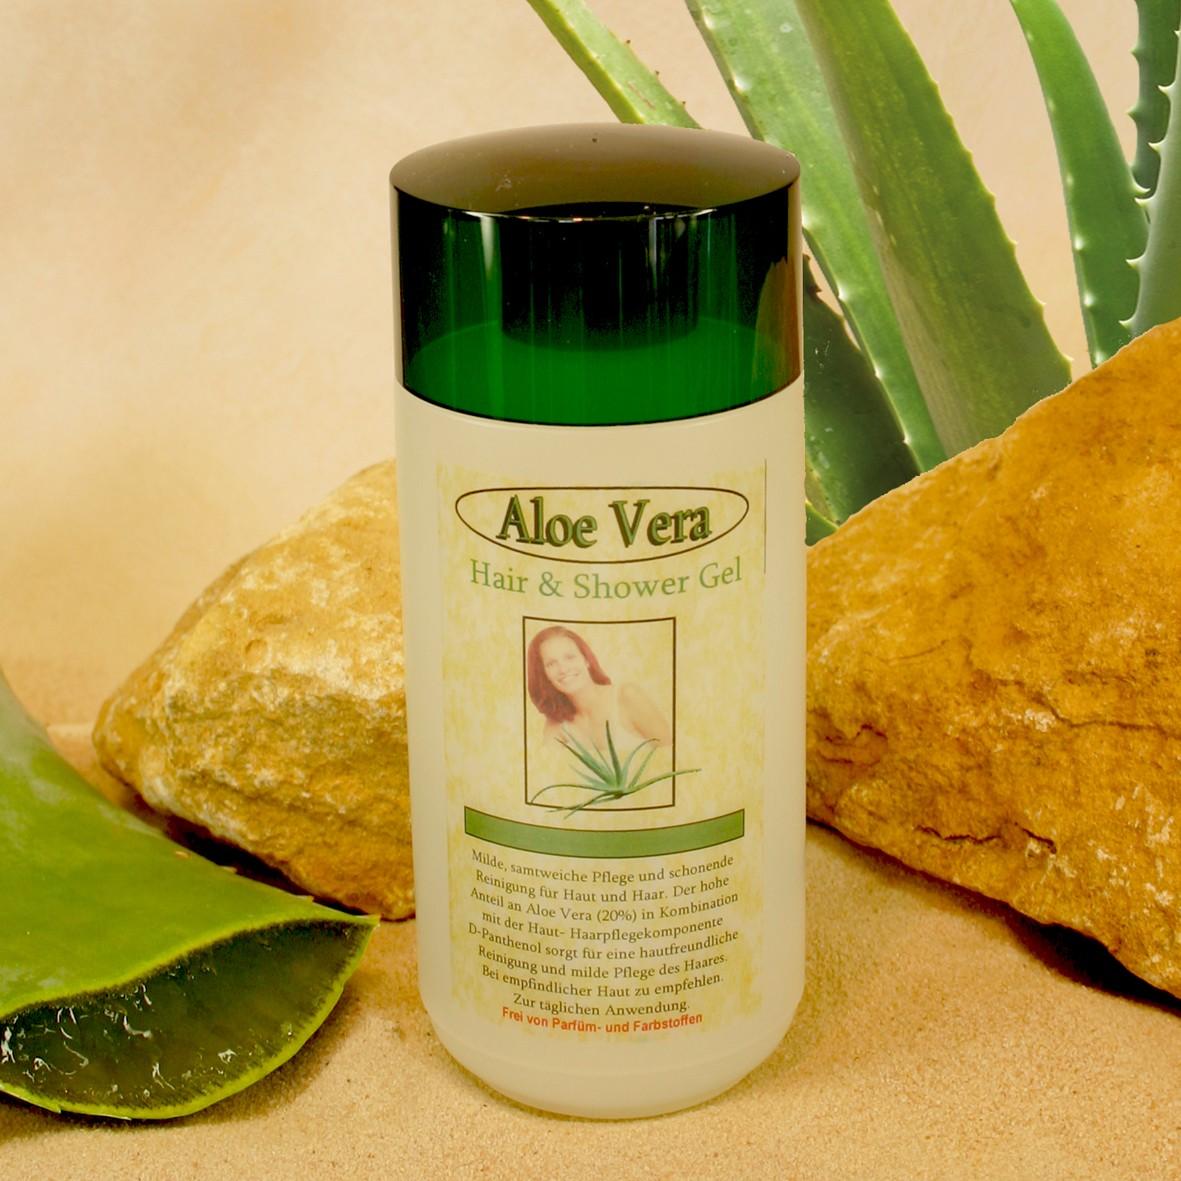 Aloe Vera Zentrum | Aloe Vera Shampoo Und Duschgel 2in1 - Produkte Aloe Vera Pflanze Pflege Anwendung